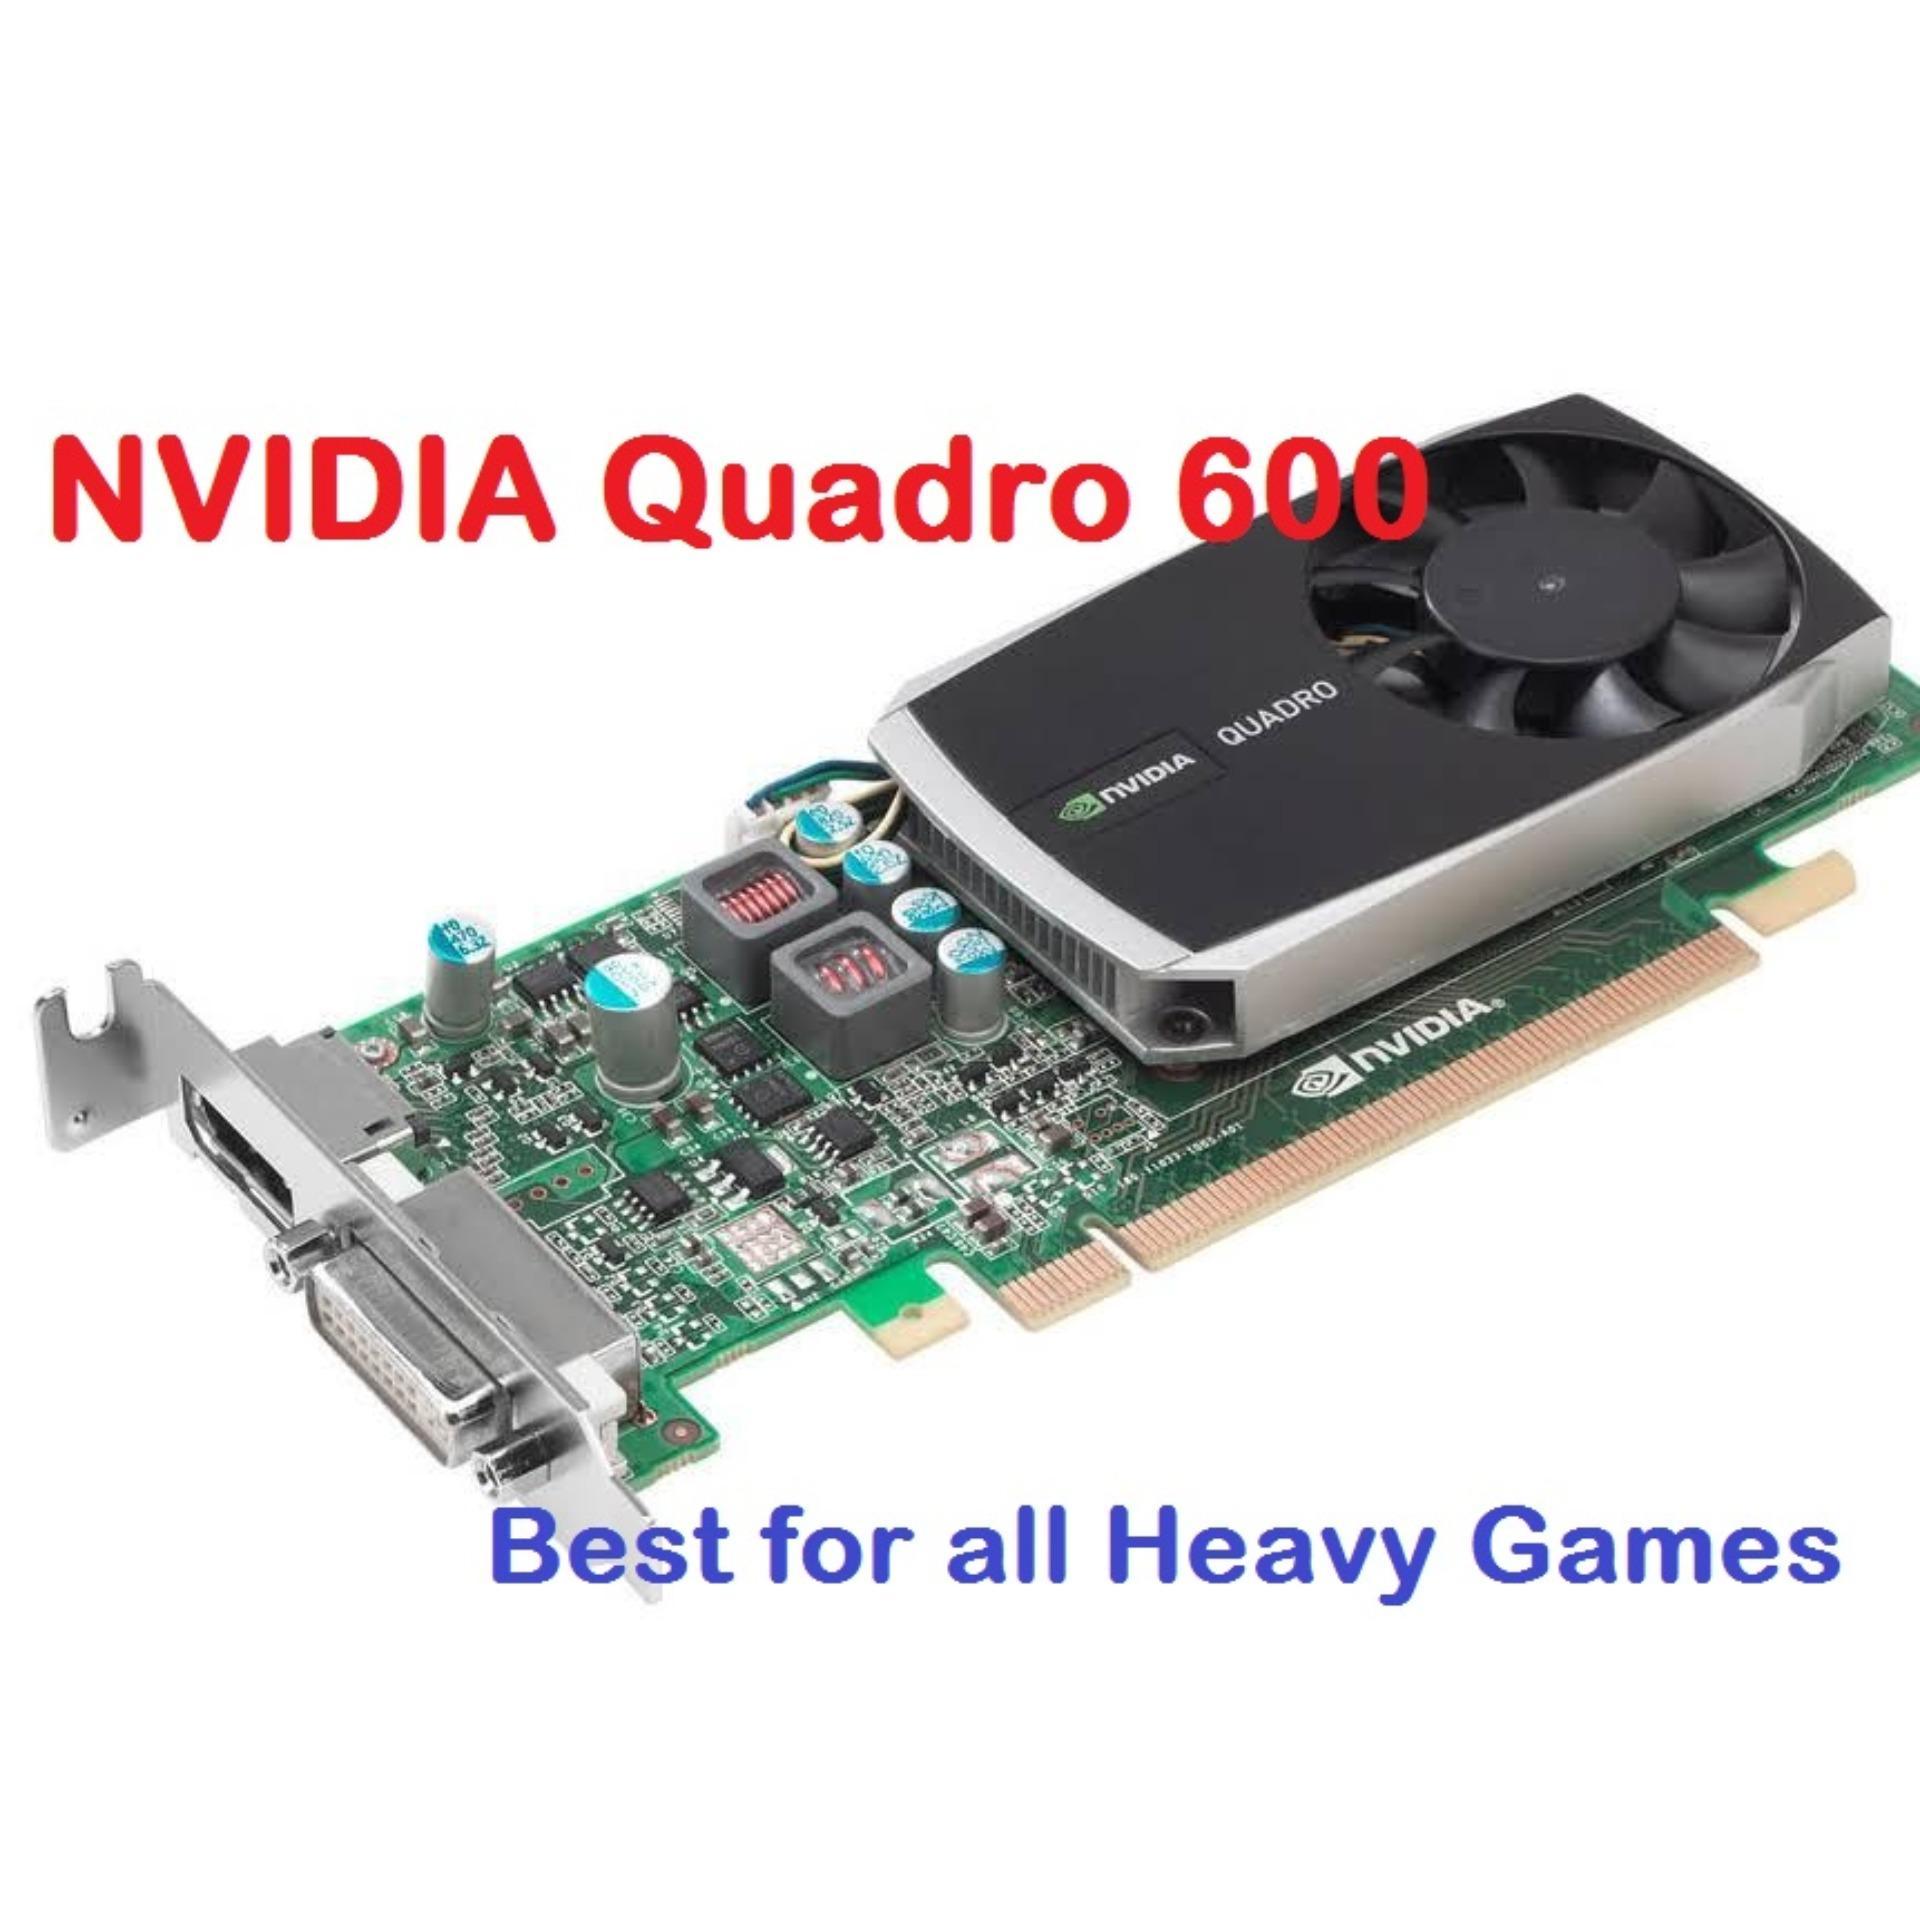 nvidia quadro 600 driver win7 64bit free download